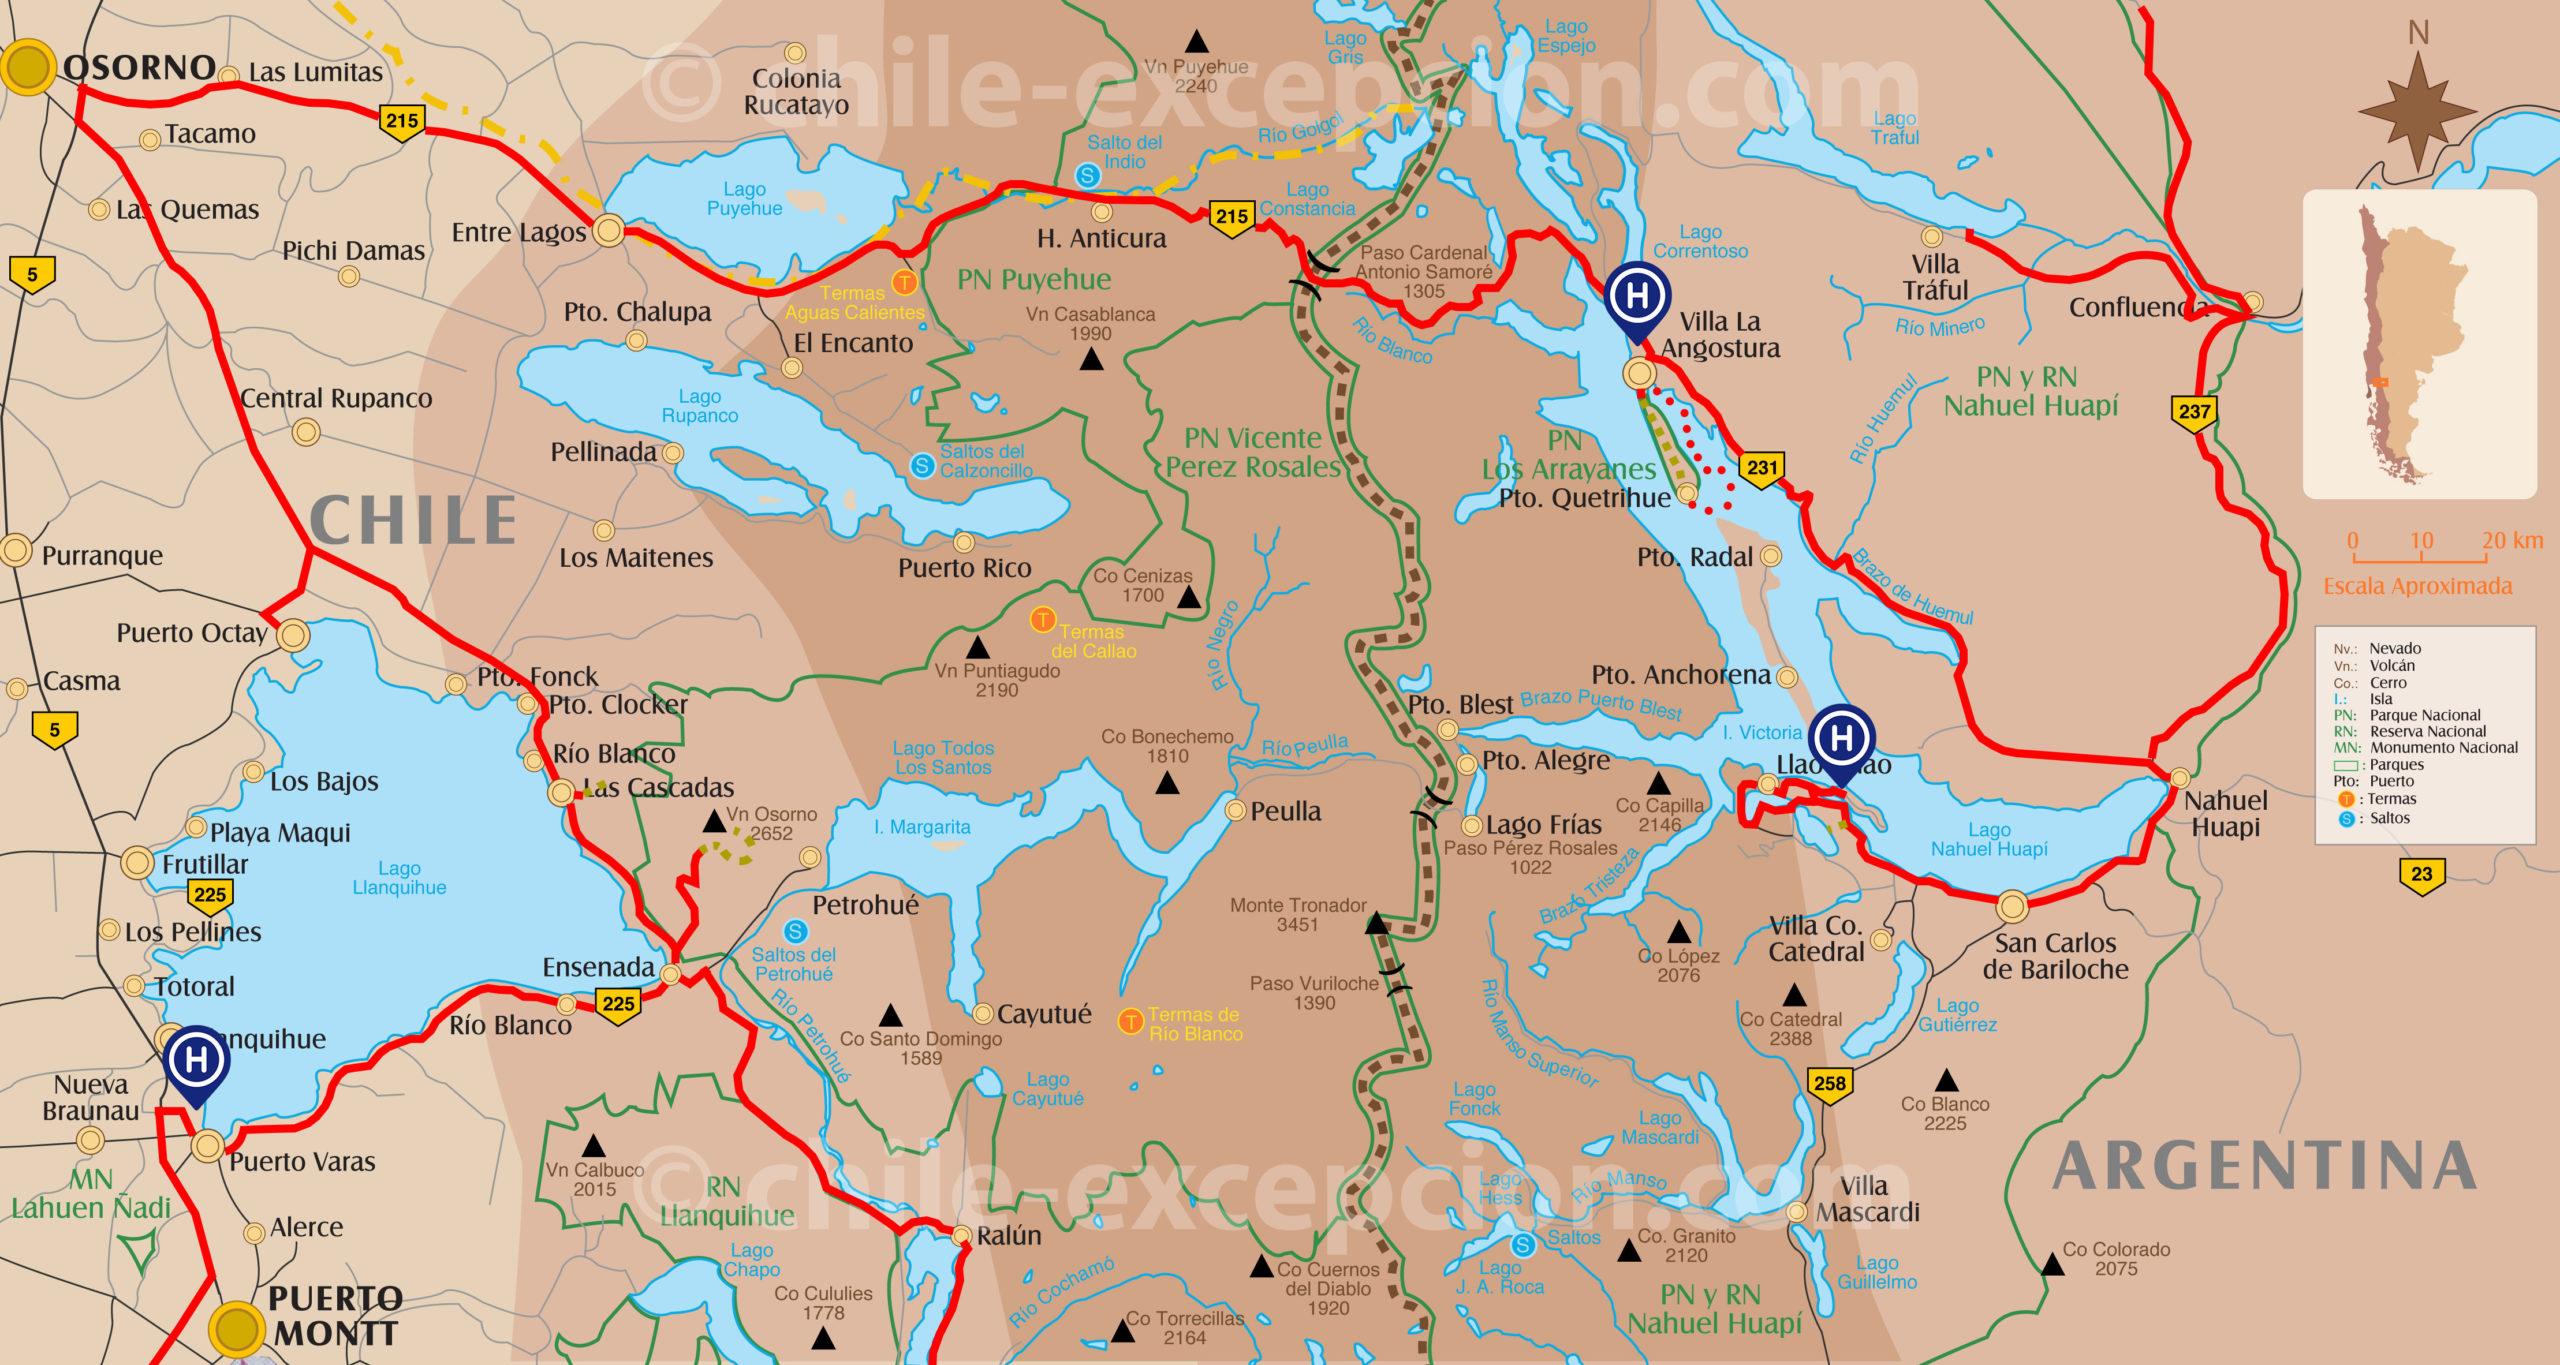 Carte zone lacs Llanquihue et Nahuel Huapi - circuit 15